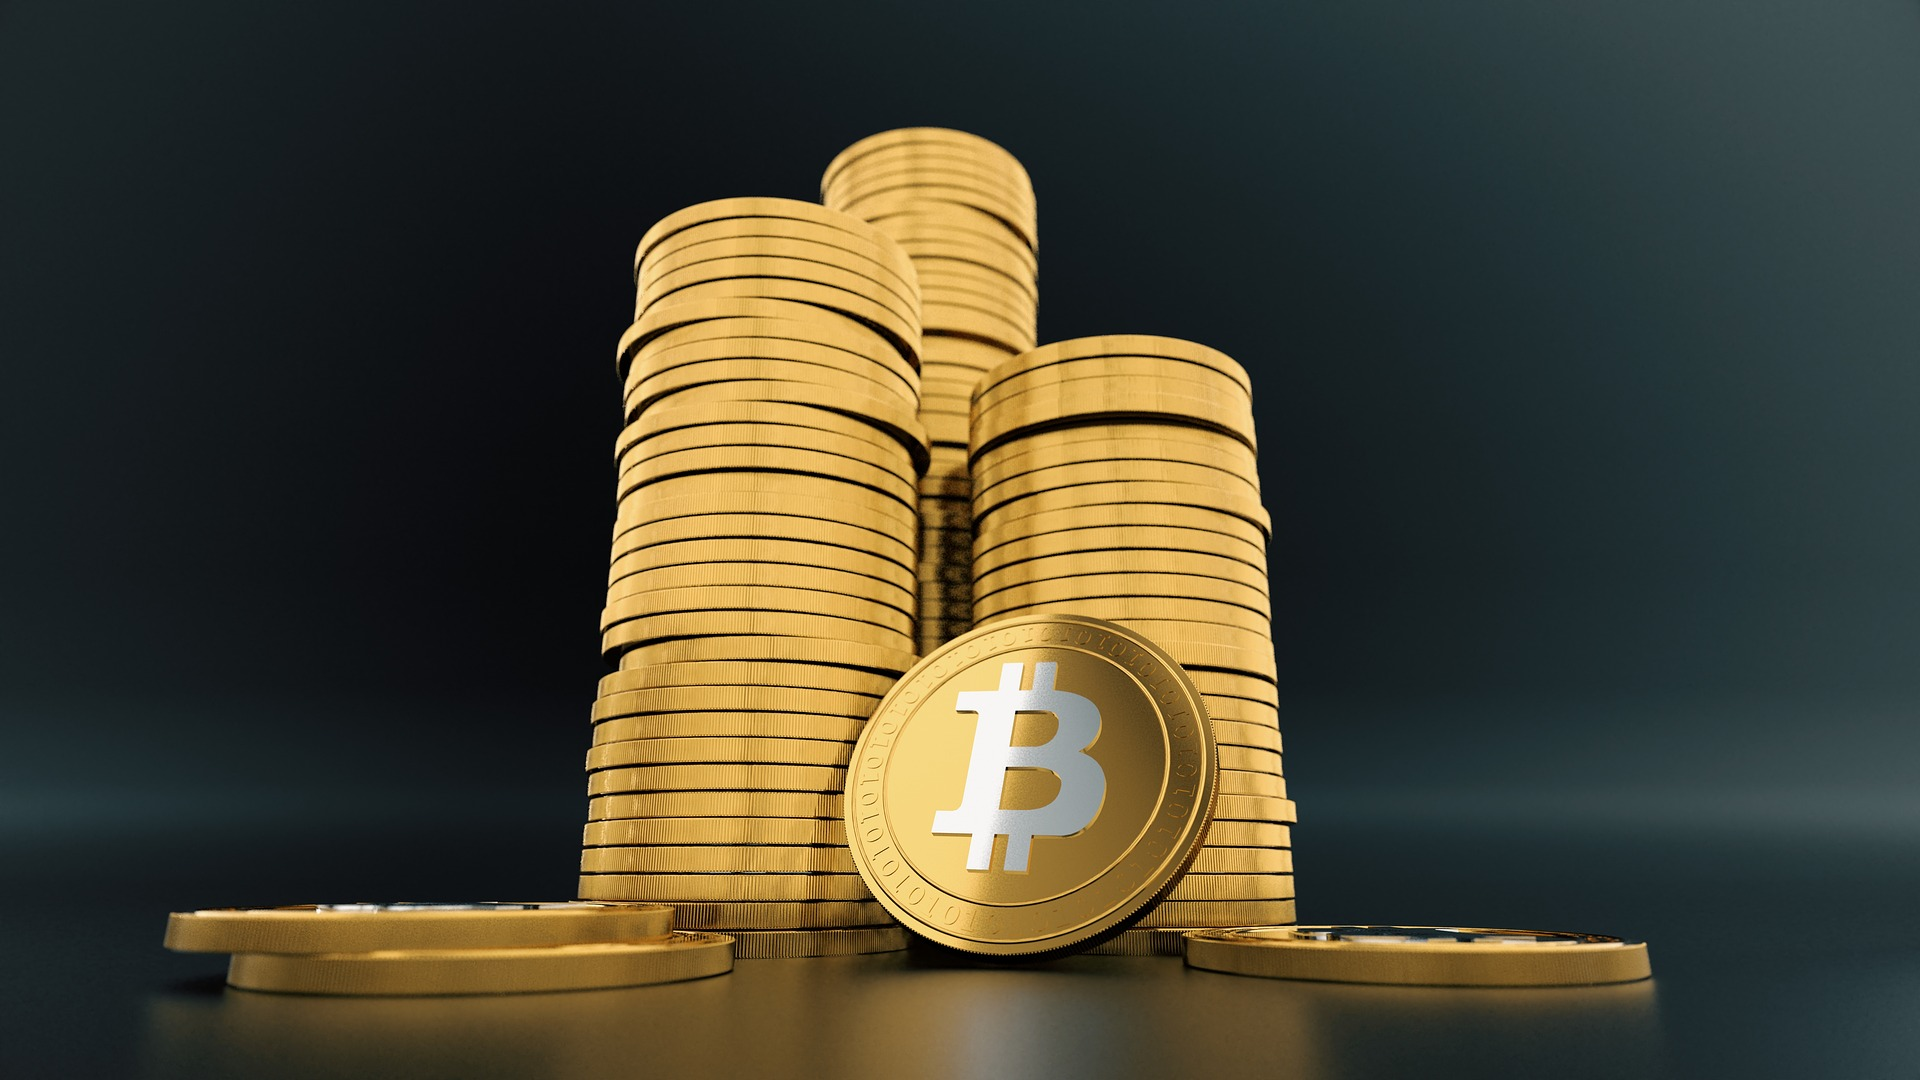 Dit hjemmesetup for Bitcoinhandel